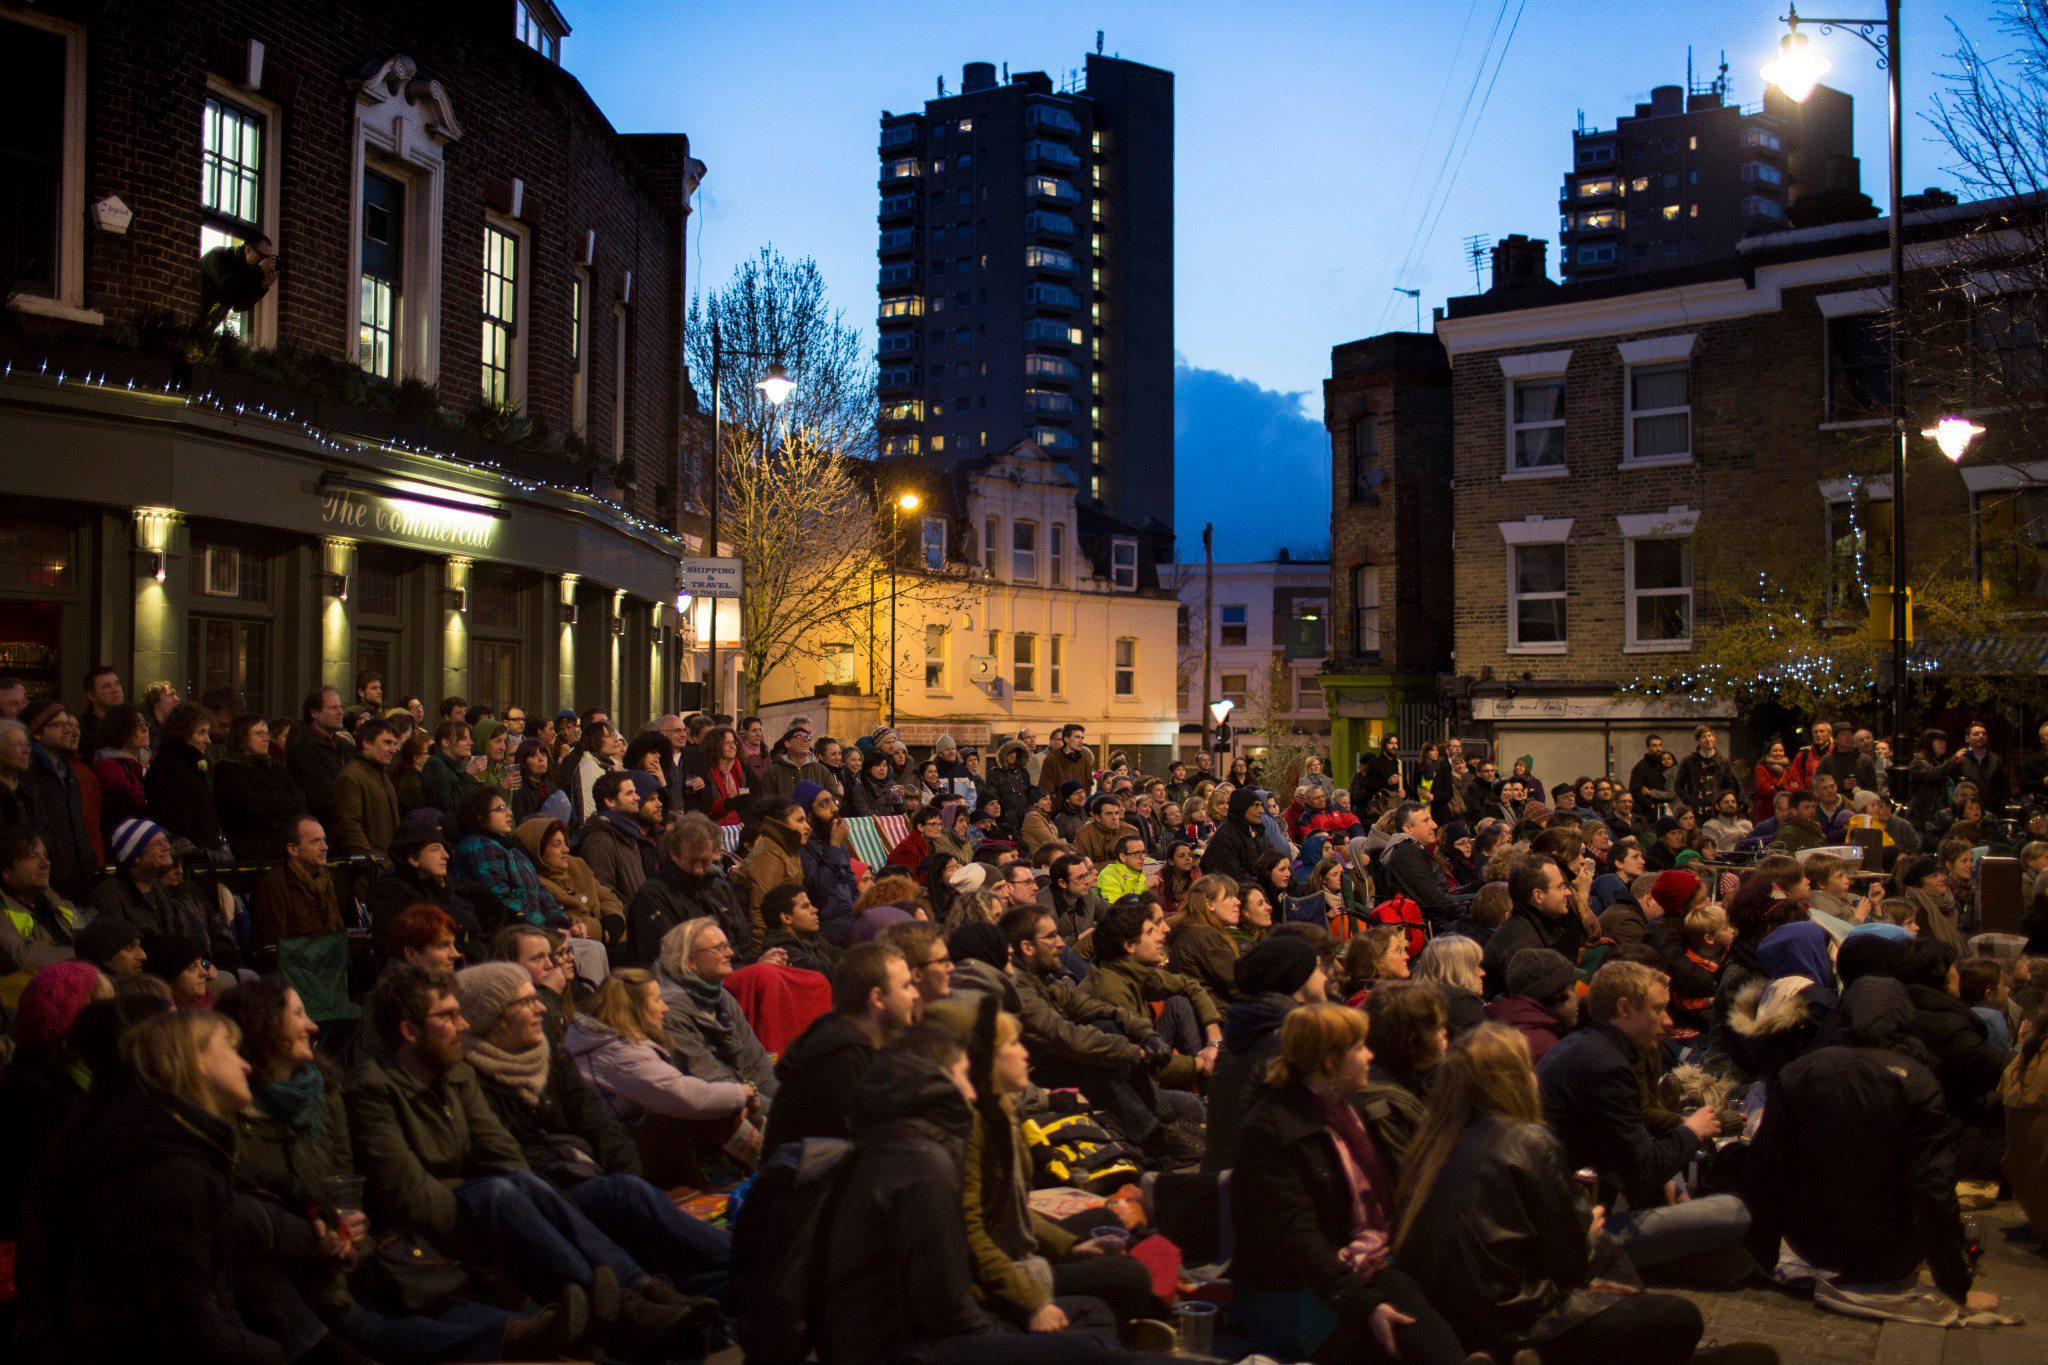 Herne-Hill-Free-Film-festival-station-square